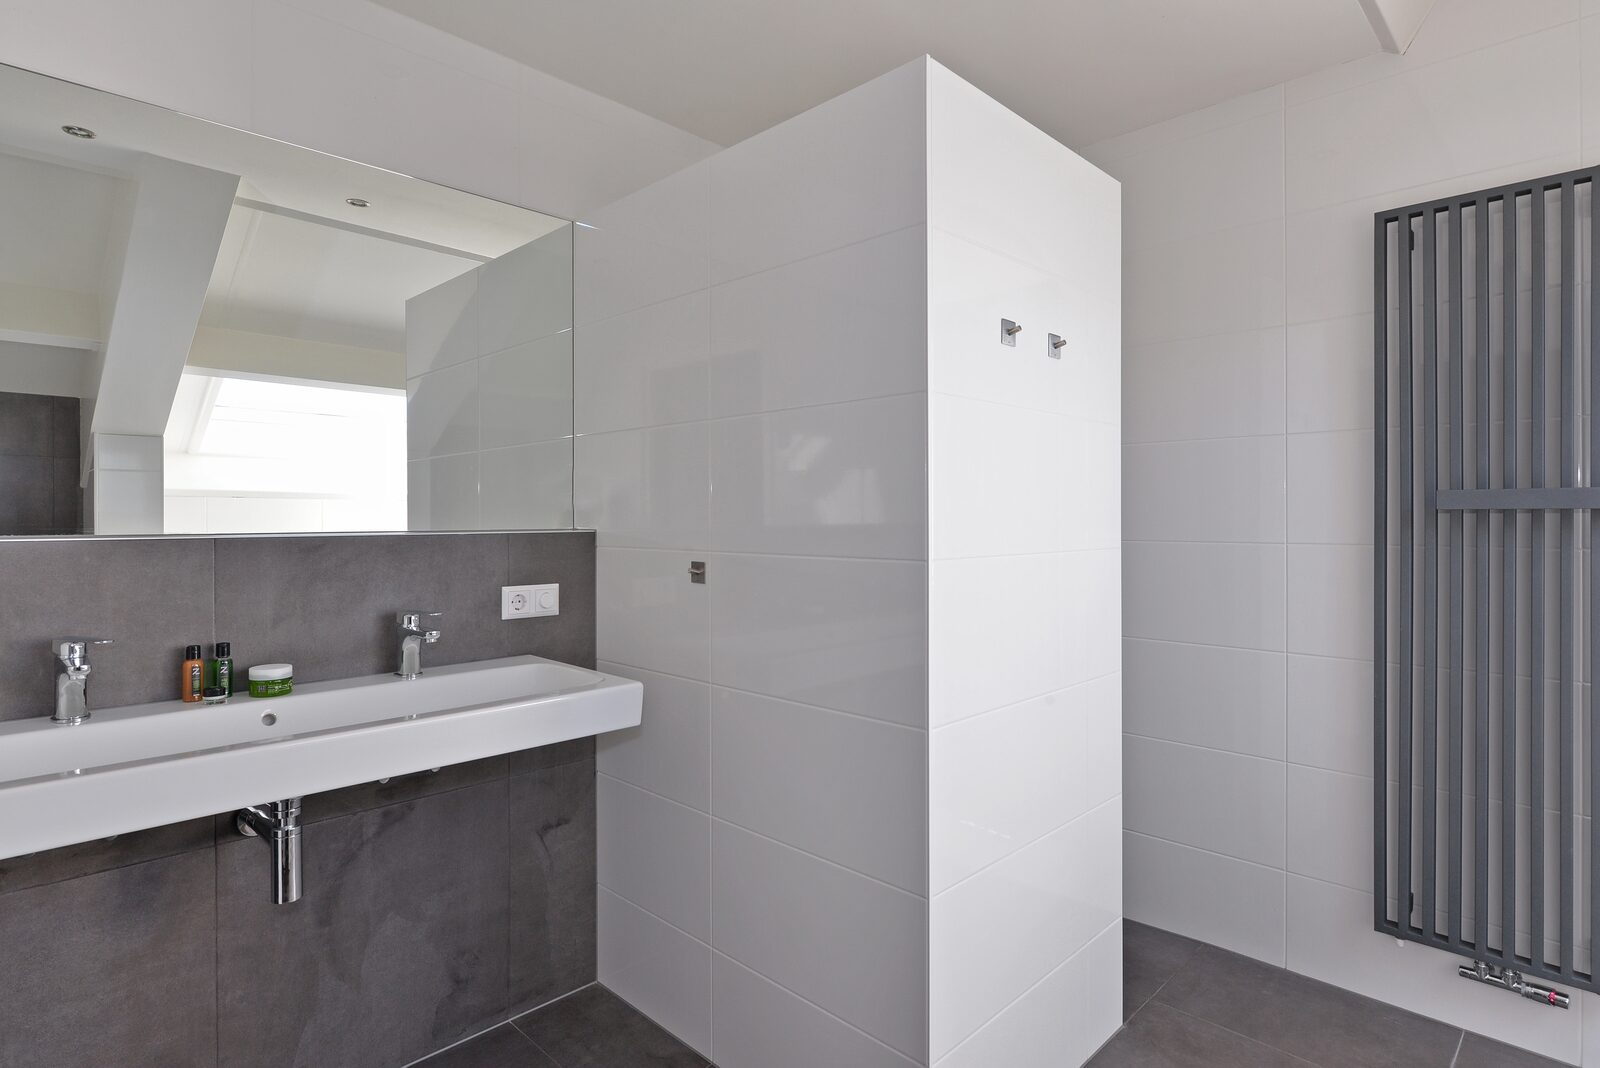 Penthouse XL | Schotsman Watersport